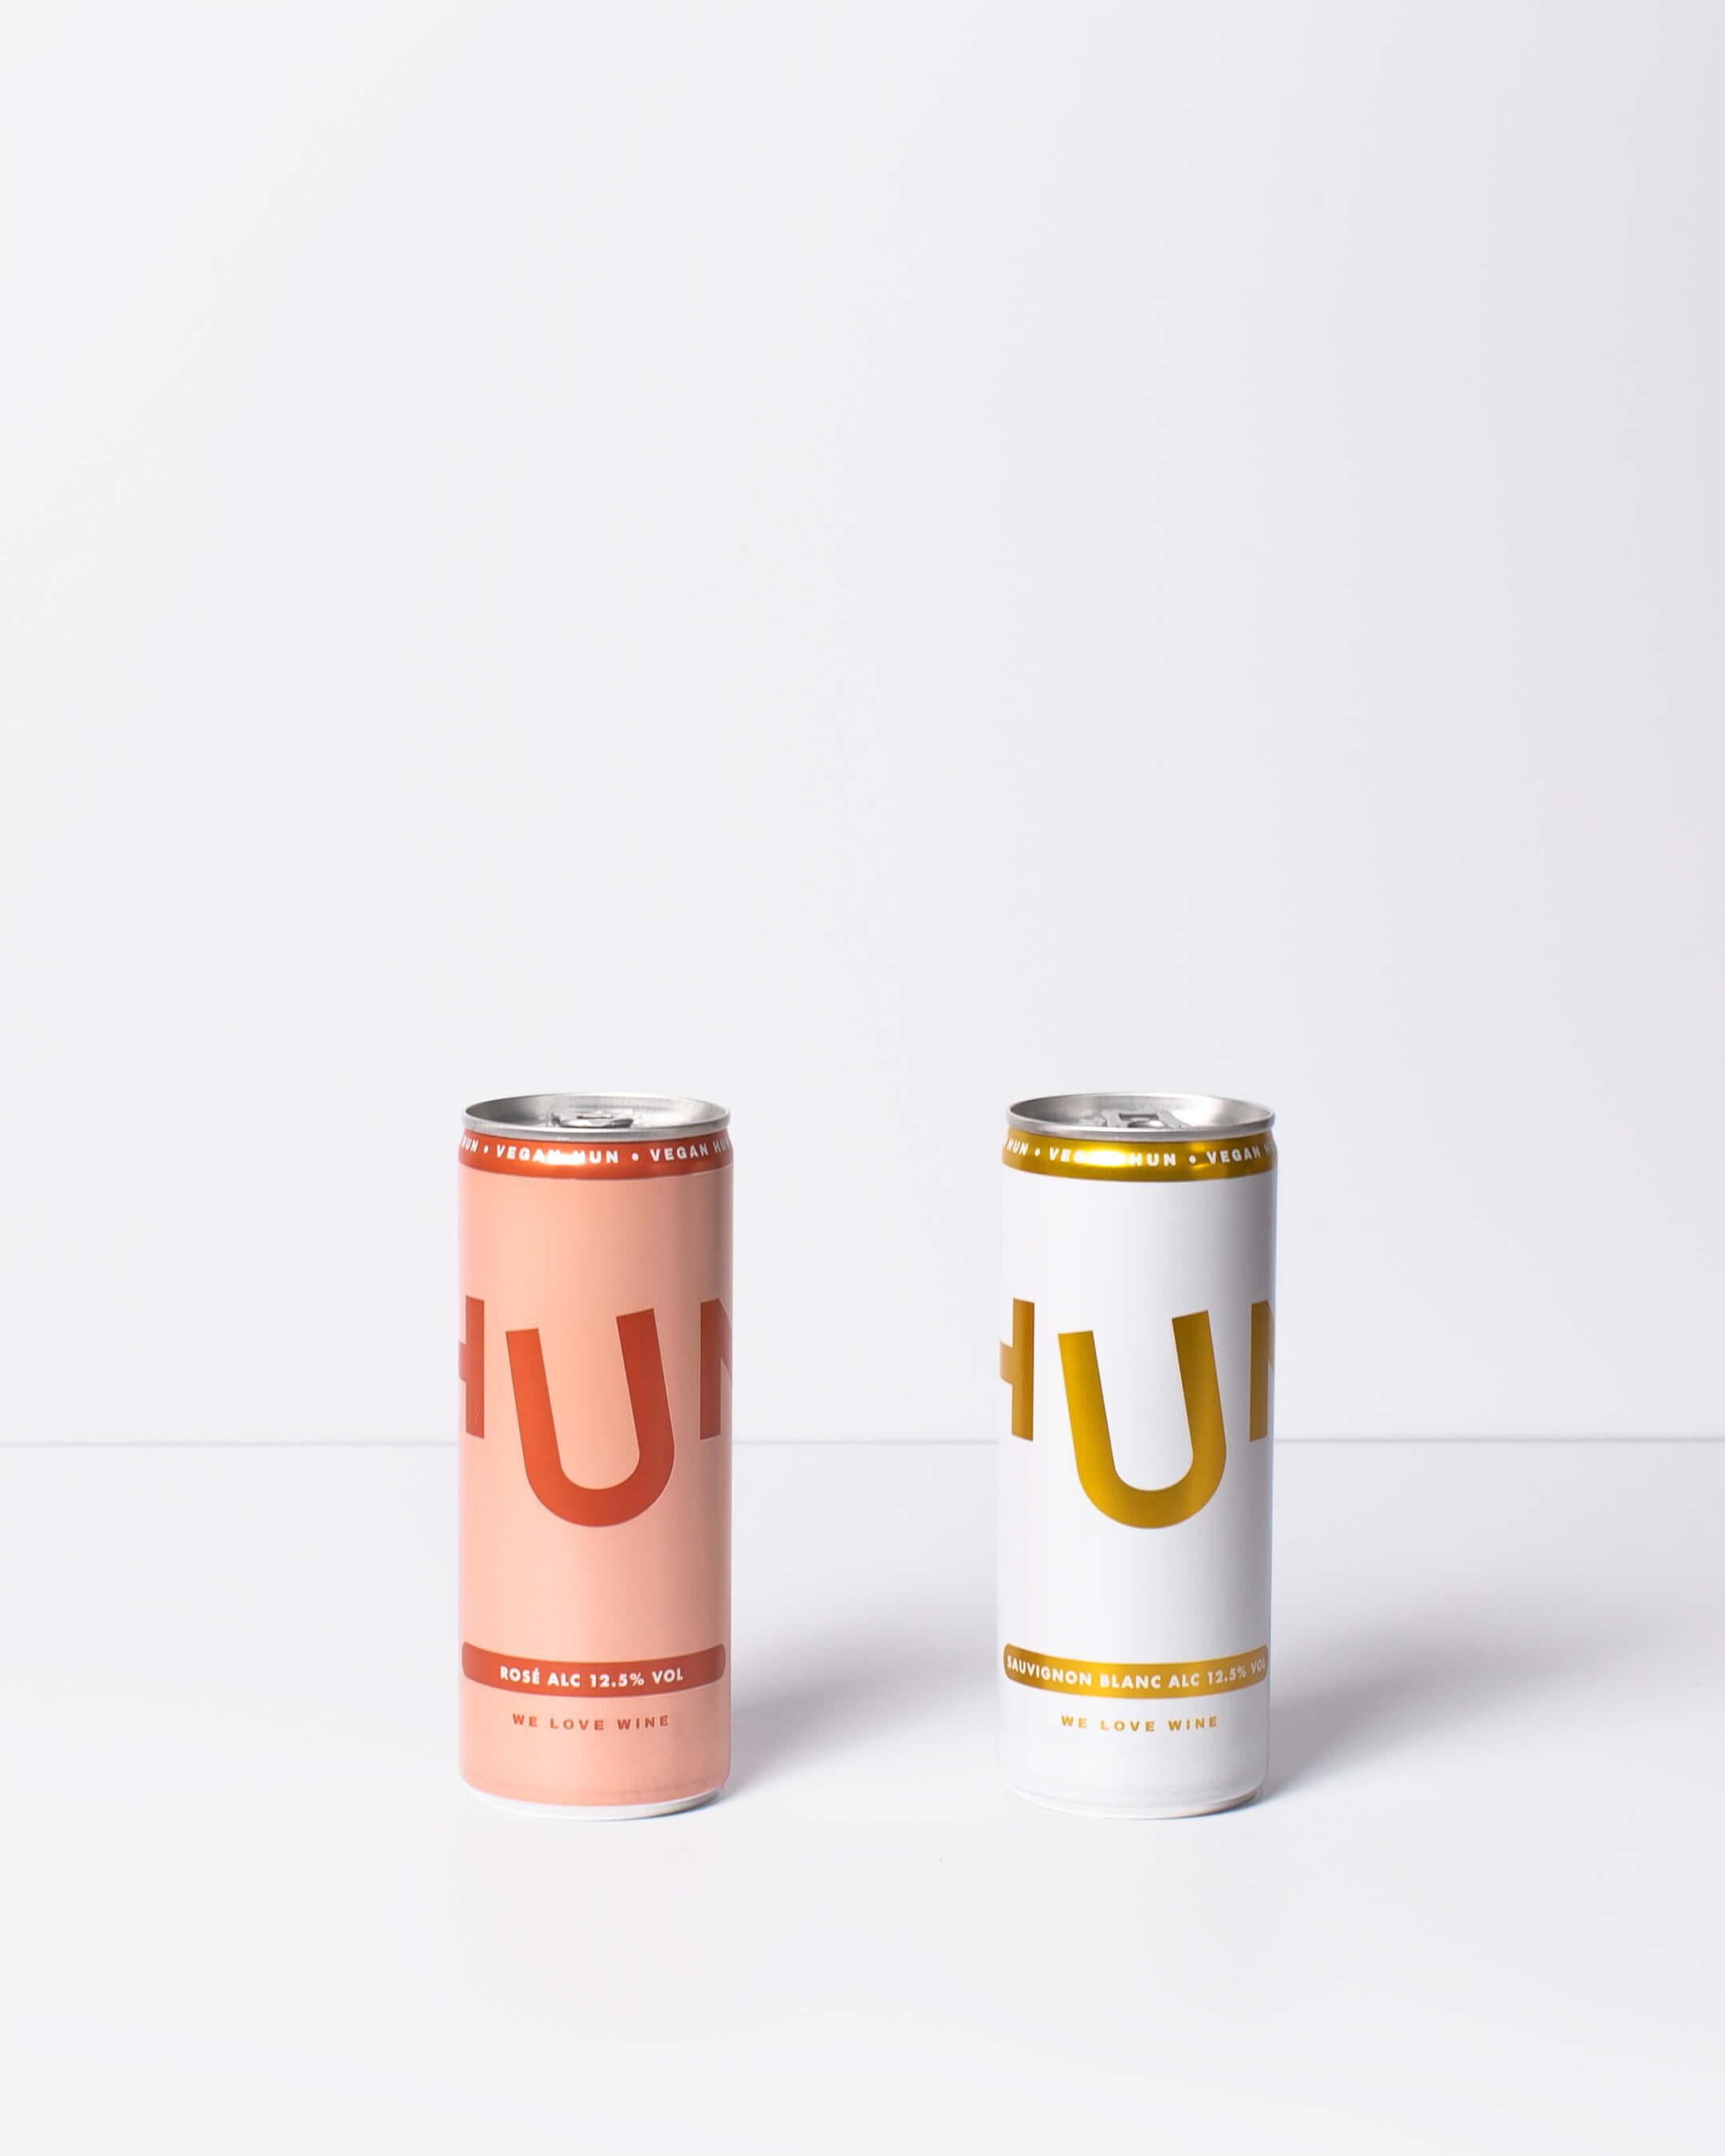 Hun white & rosé wine cans